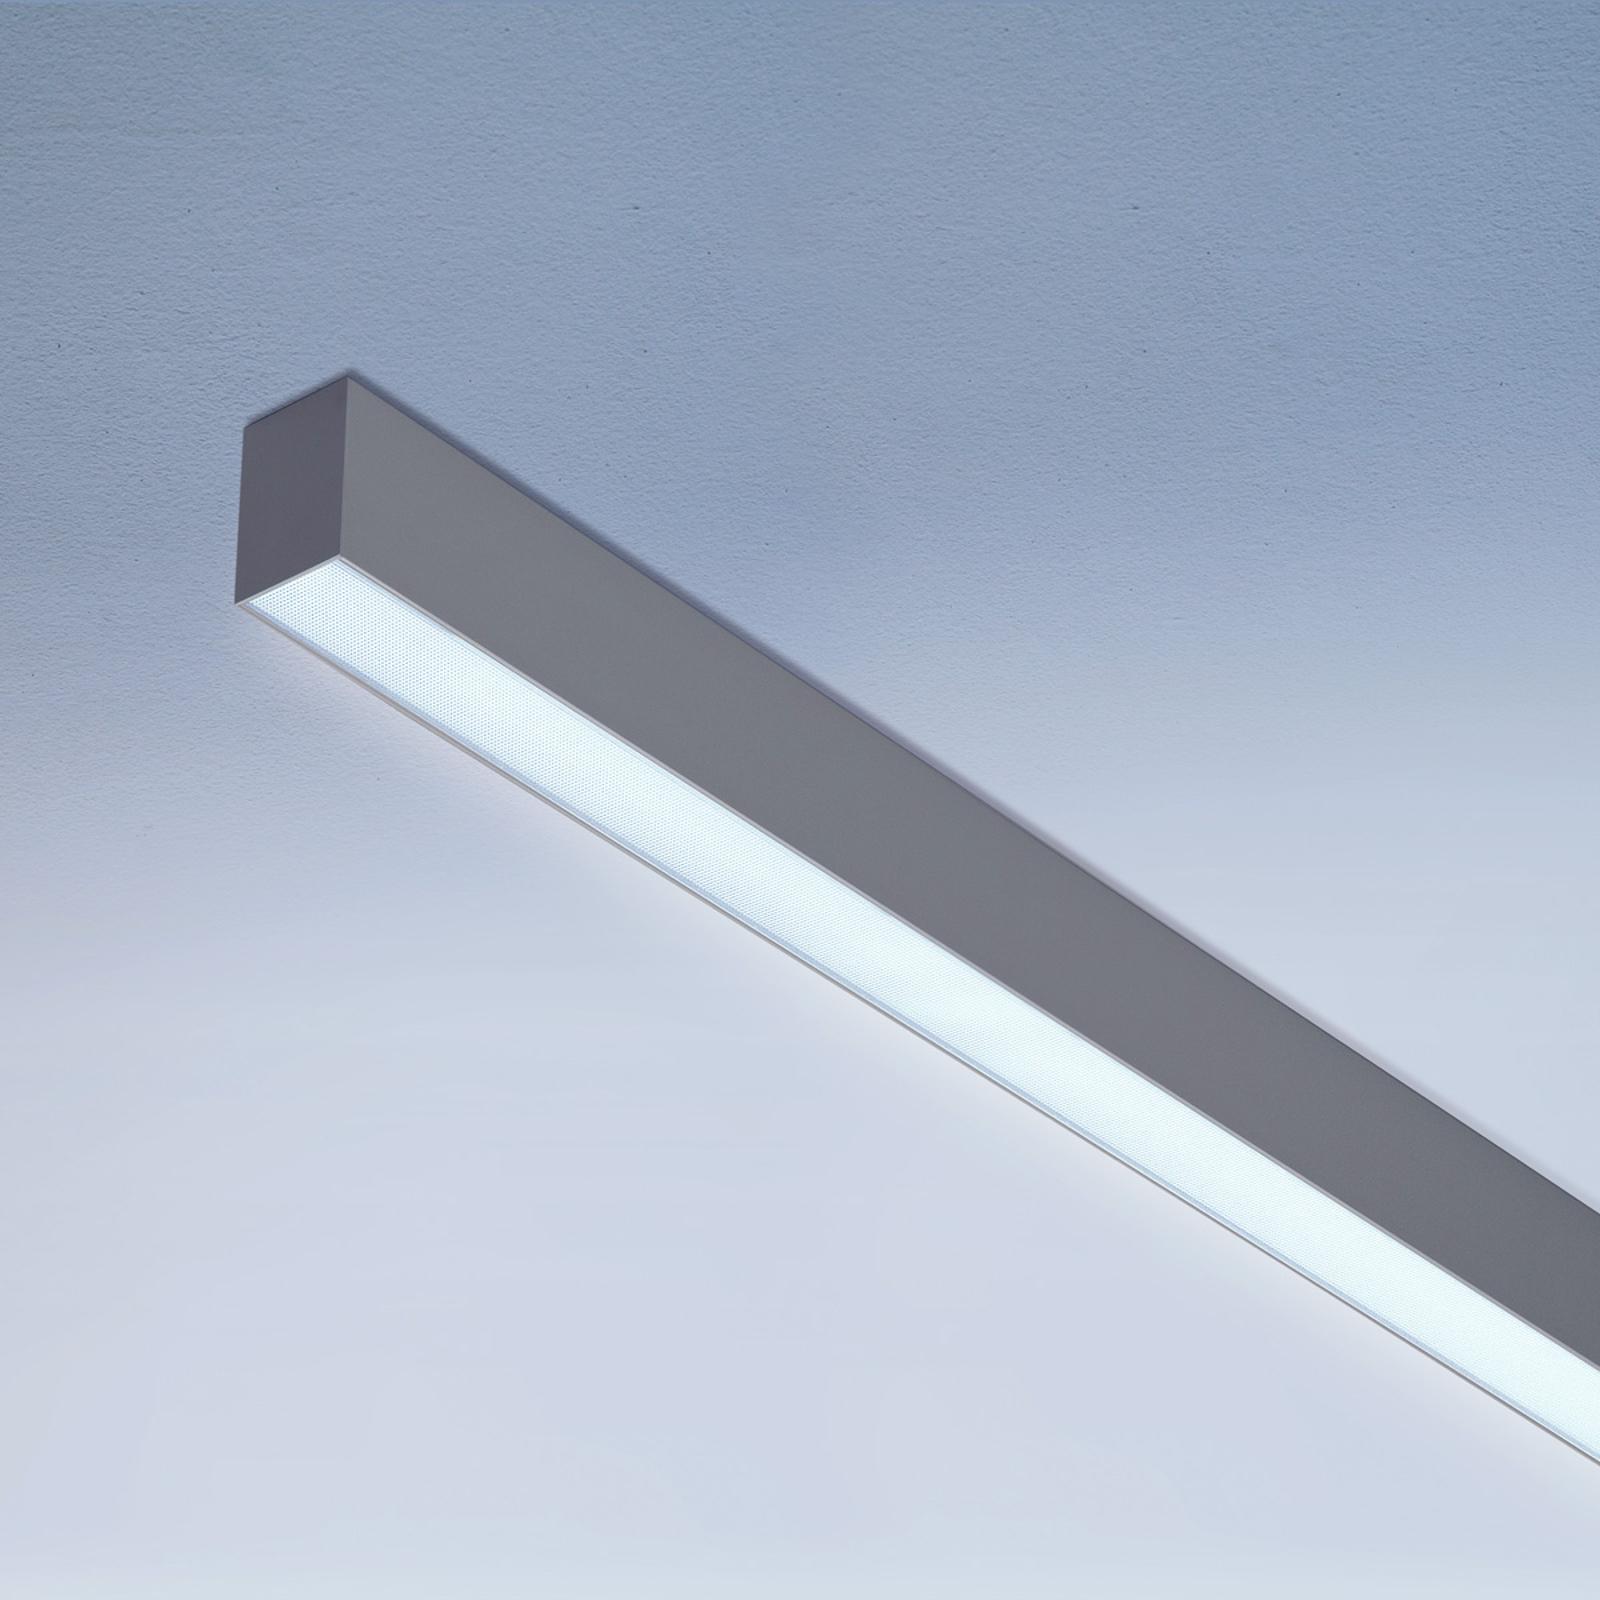 Keskiteho - LED-seinävalaisin Matric-A3 89 cm 24